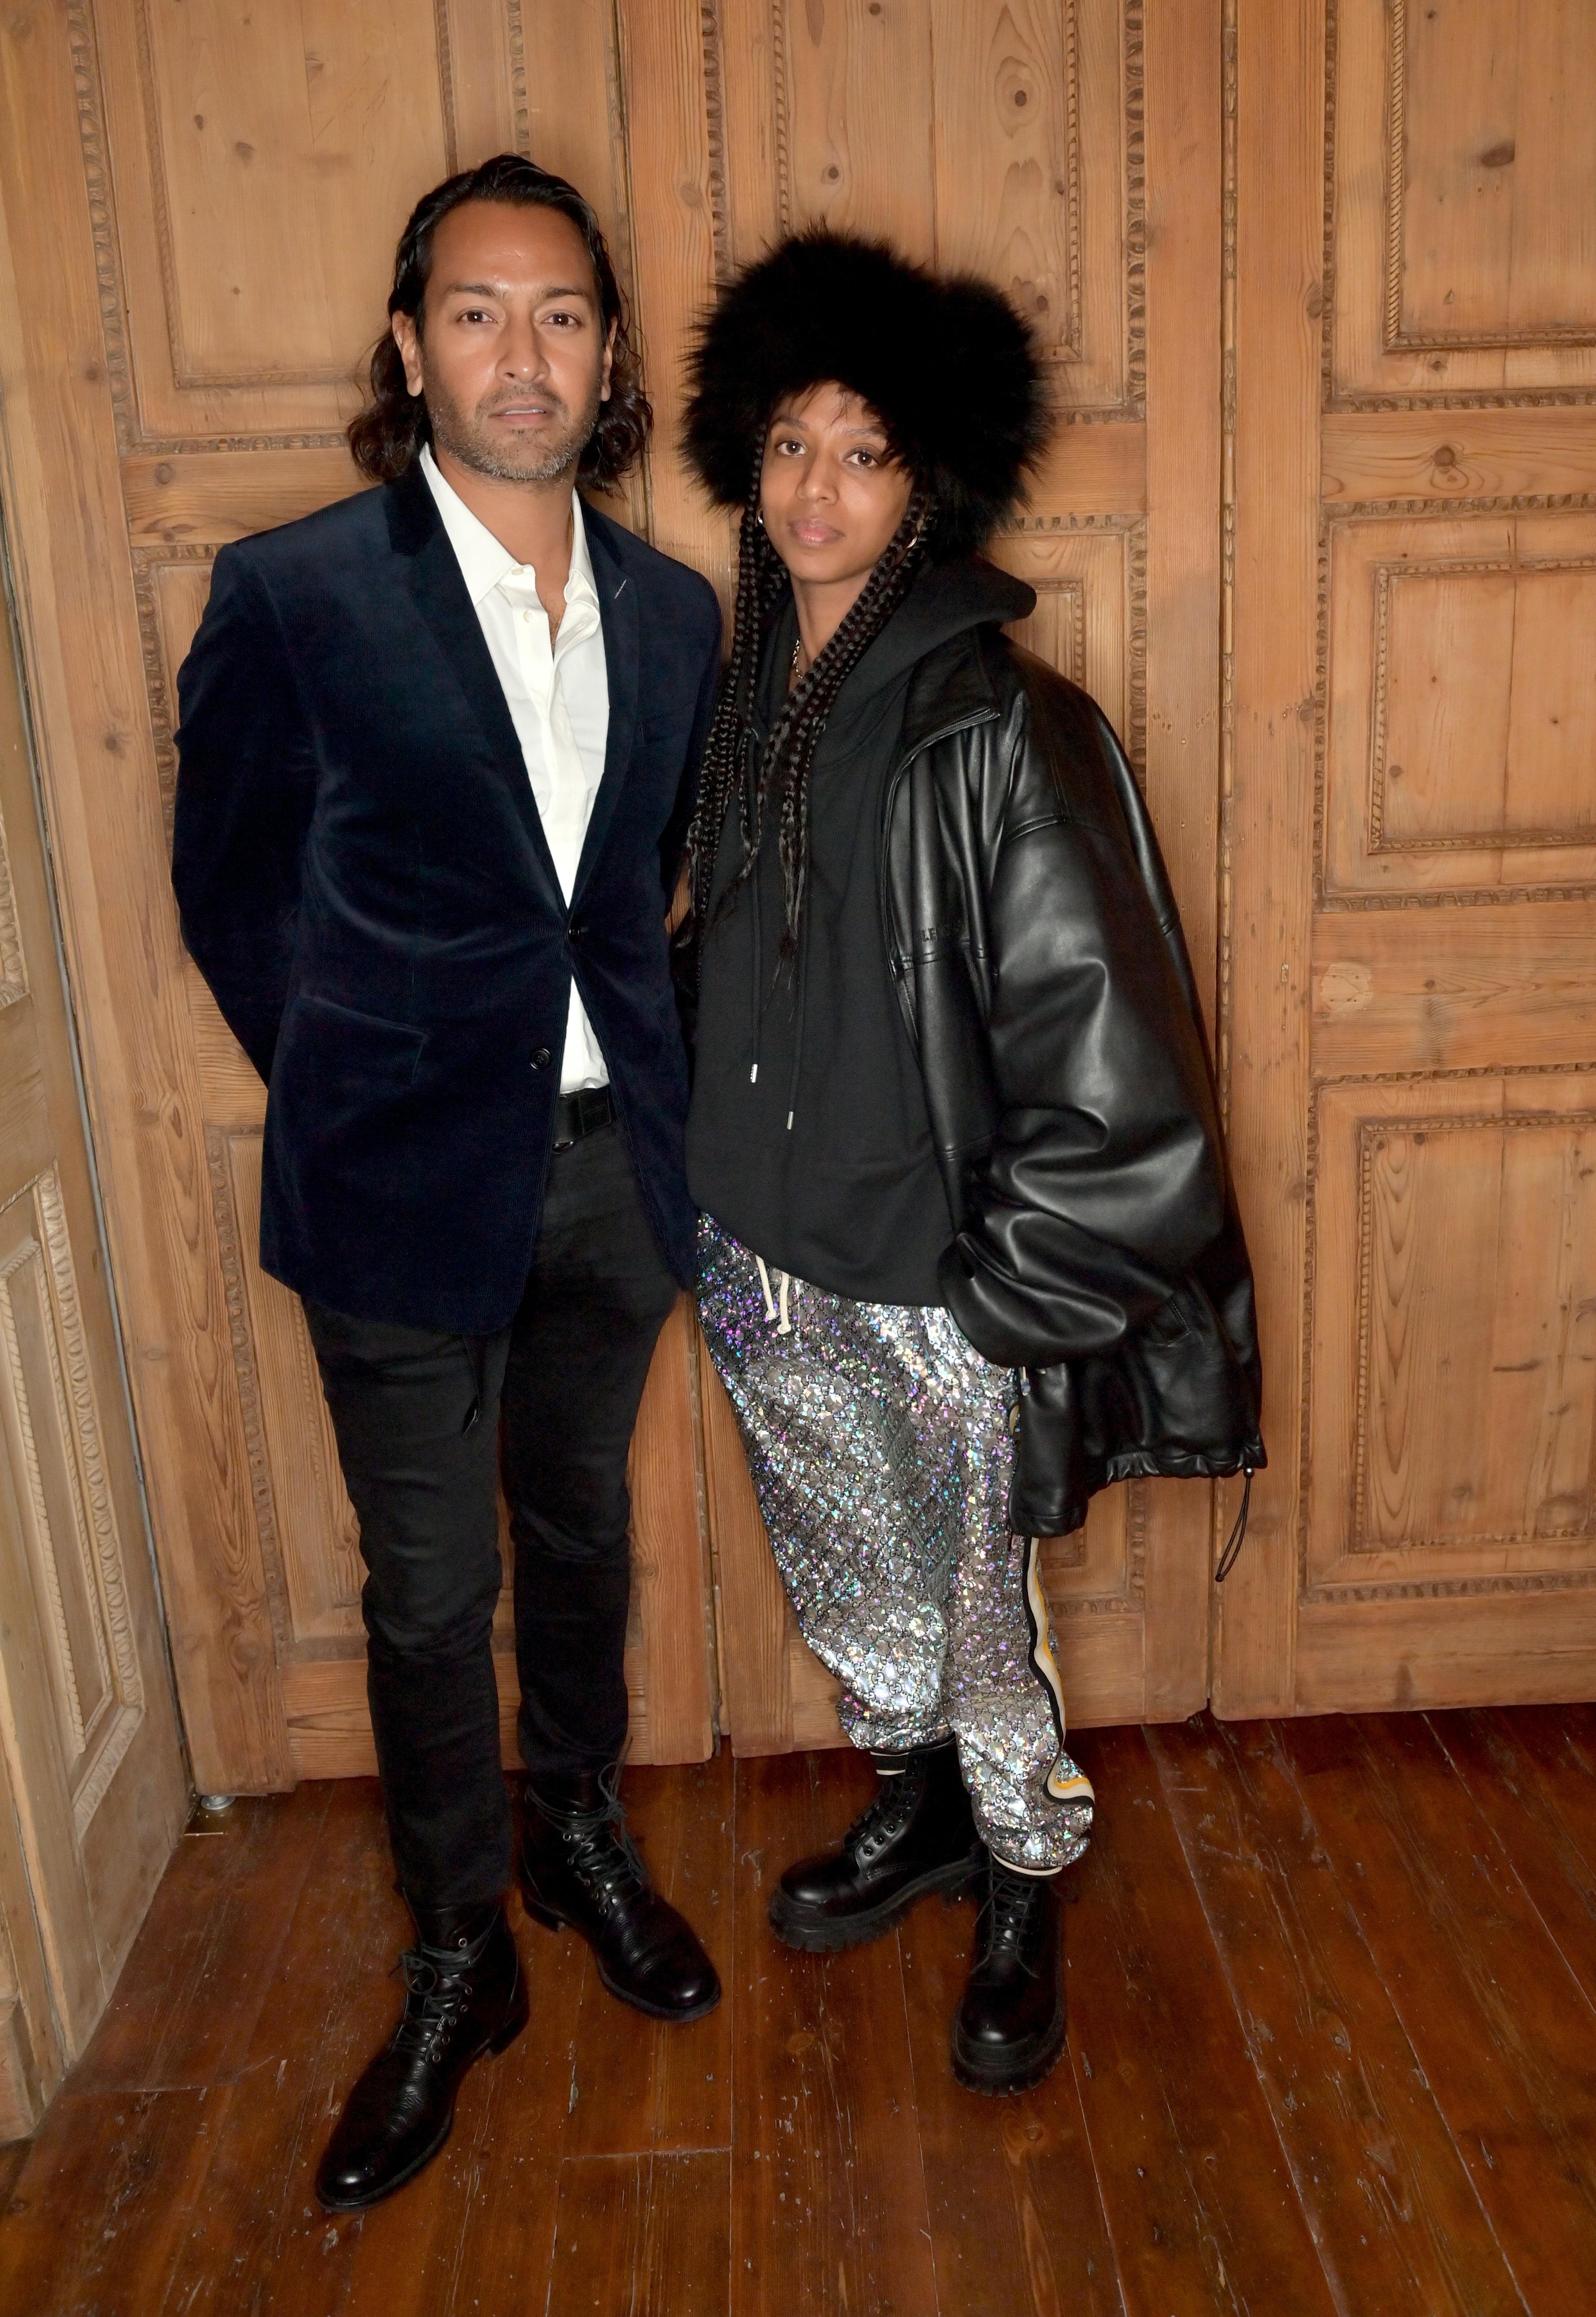 Jamil Shamasdin and Janaya 'Future' Khan. Getty Images.